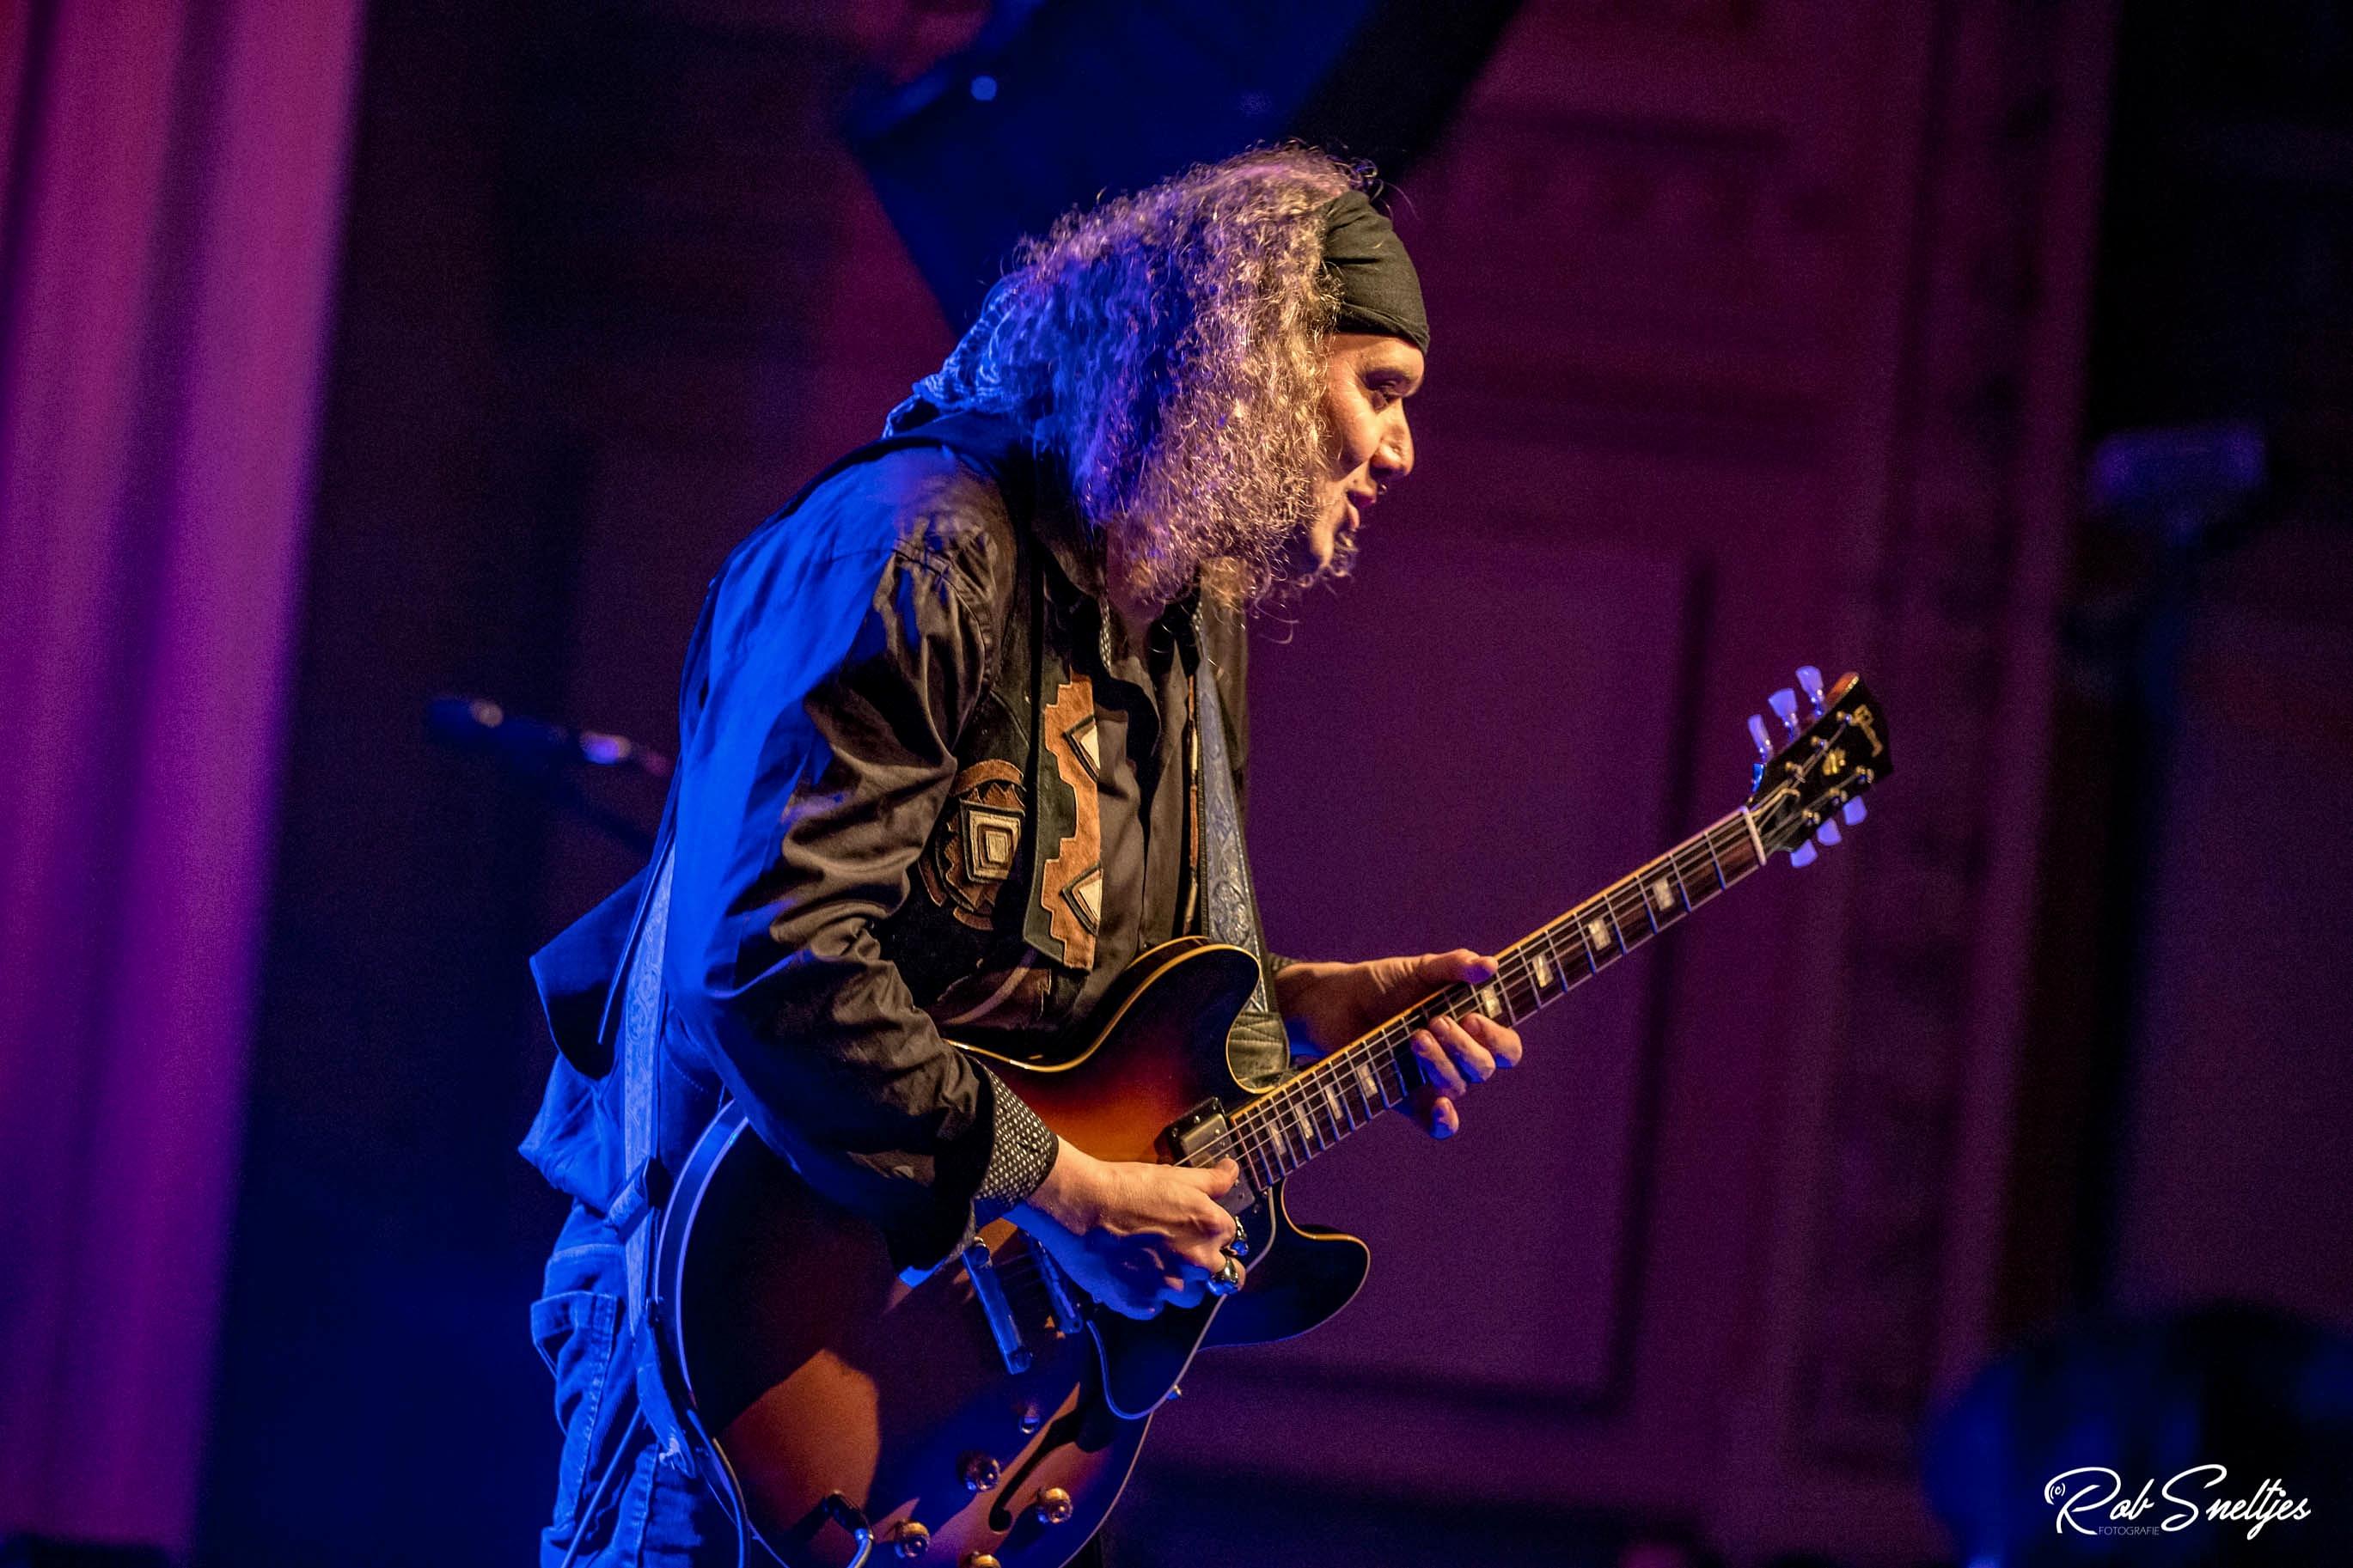 Julian-Sas-Band-Luxor-Live-Arnhem-2018-©RobSneltjes6K4A5273-copy-4